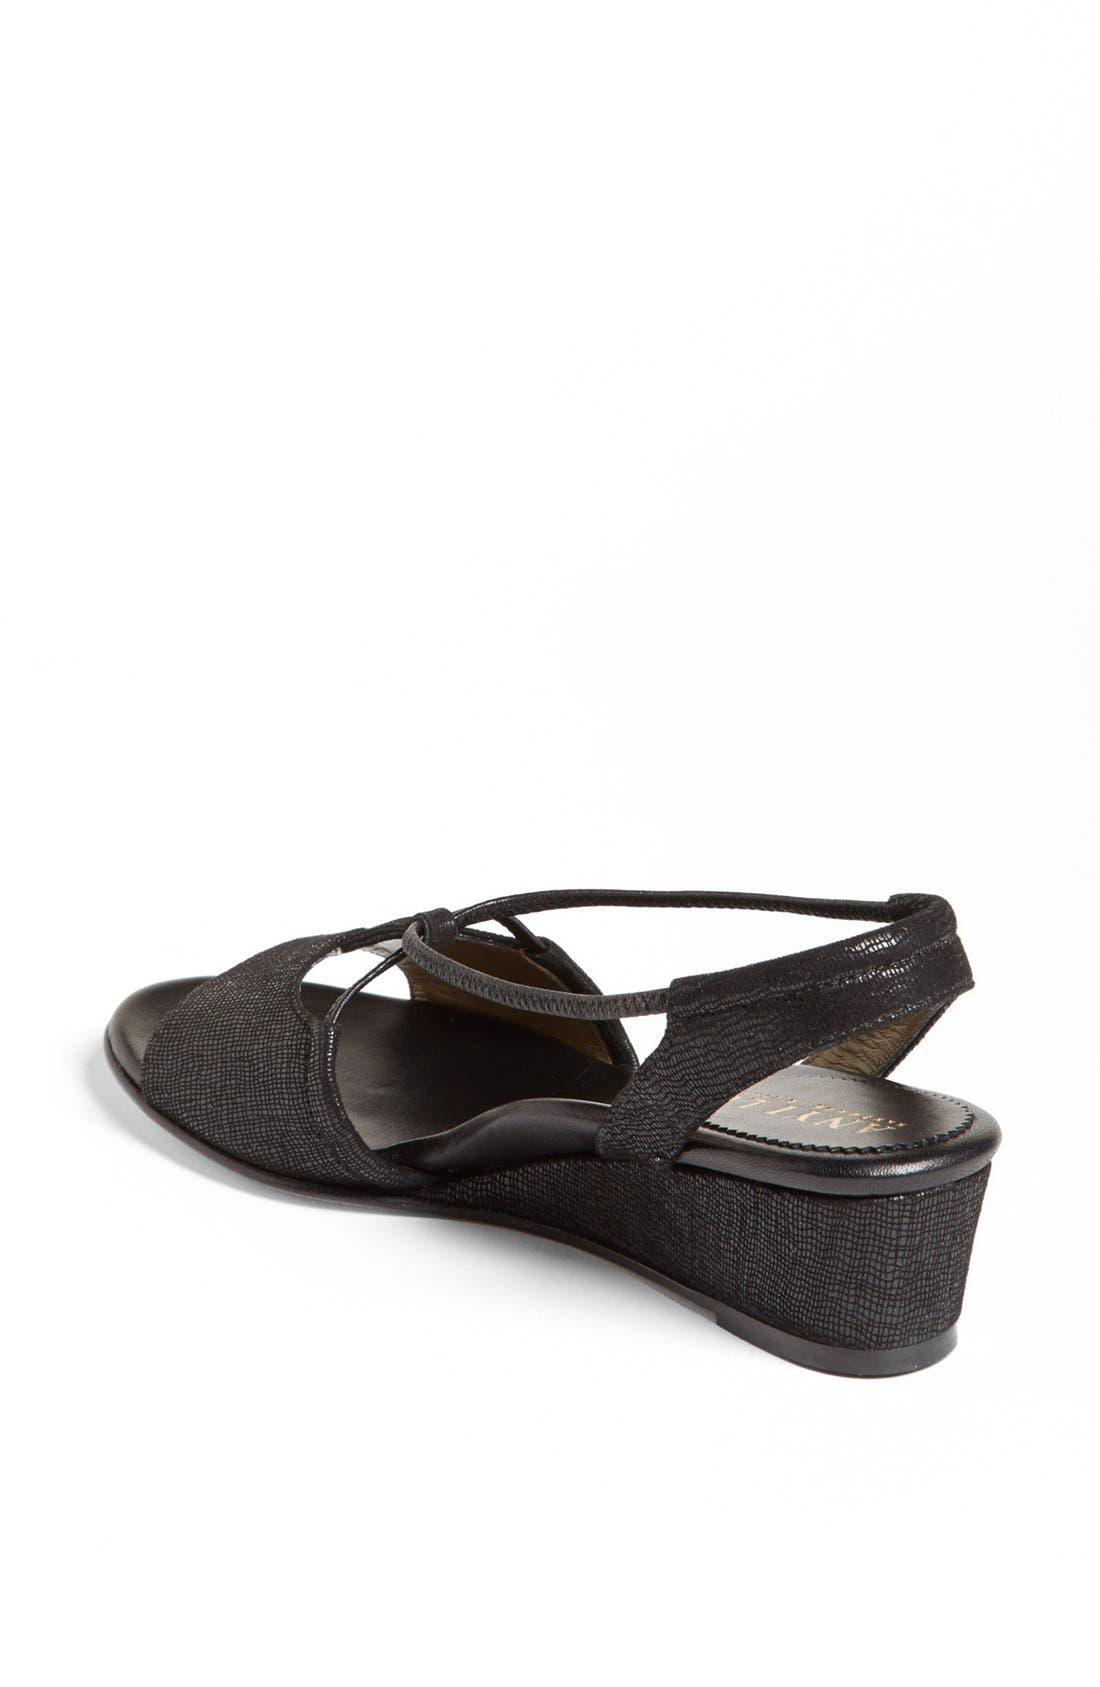 Alternate Image 2  - Anyi Lu 'Linda' Sandal